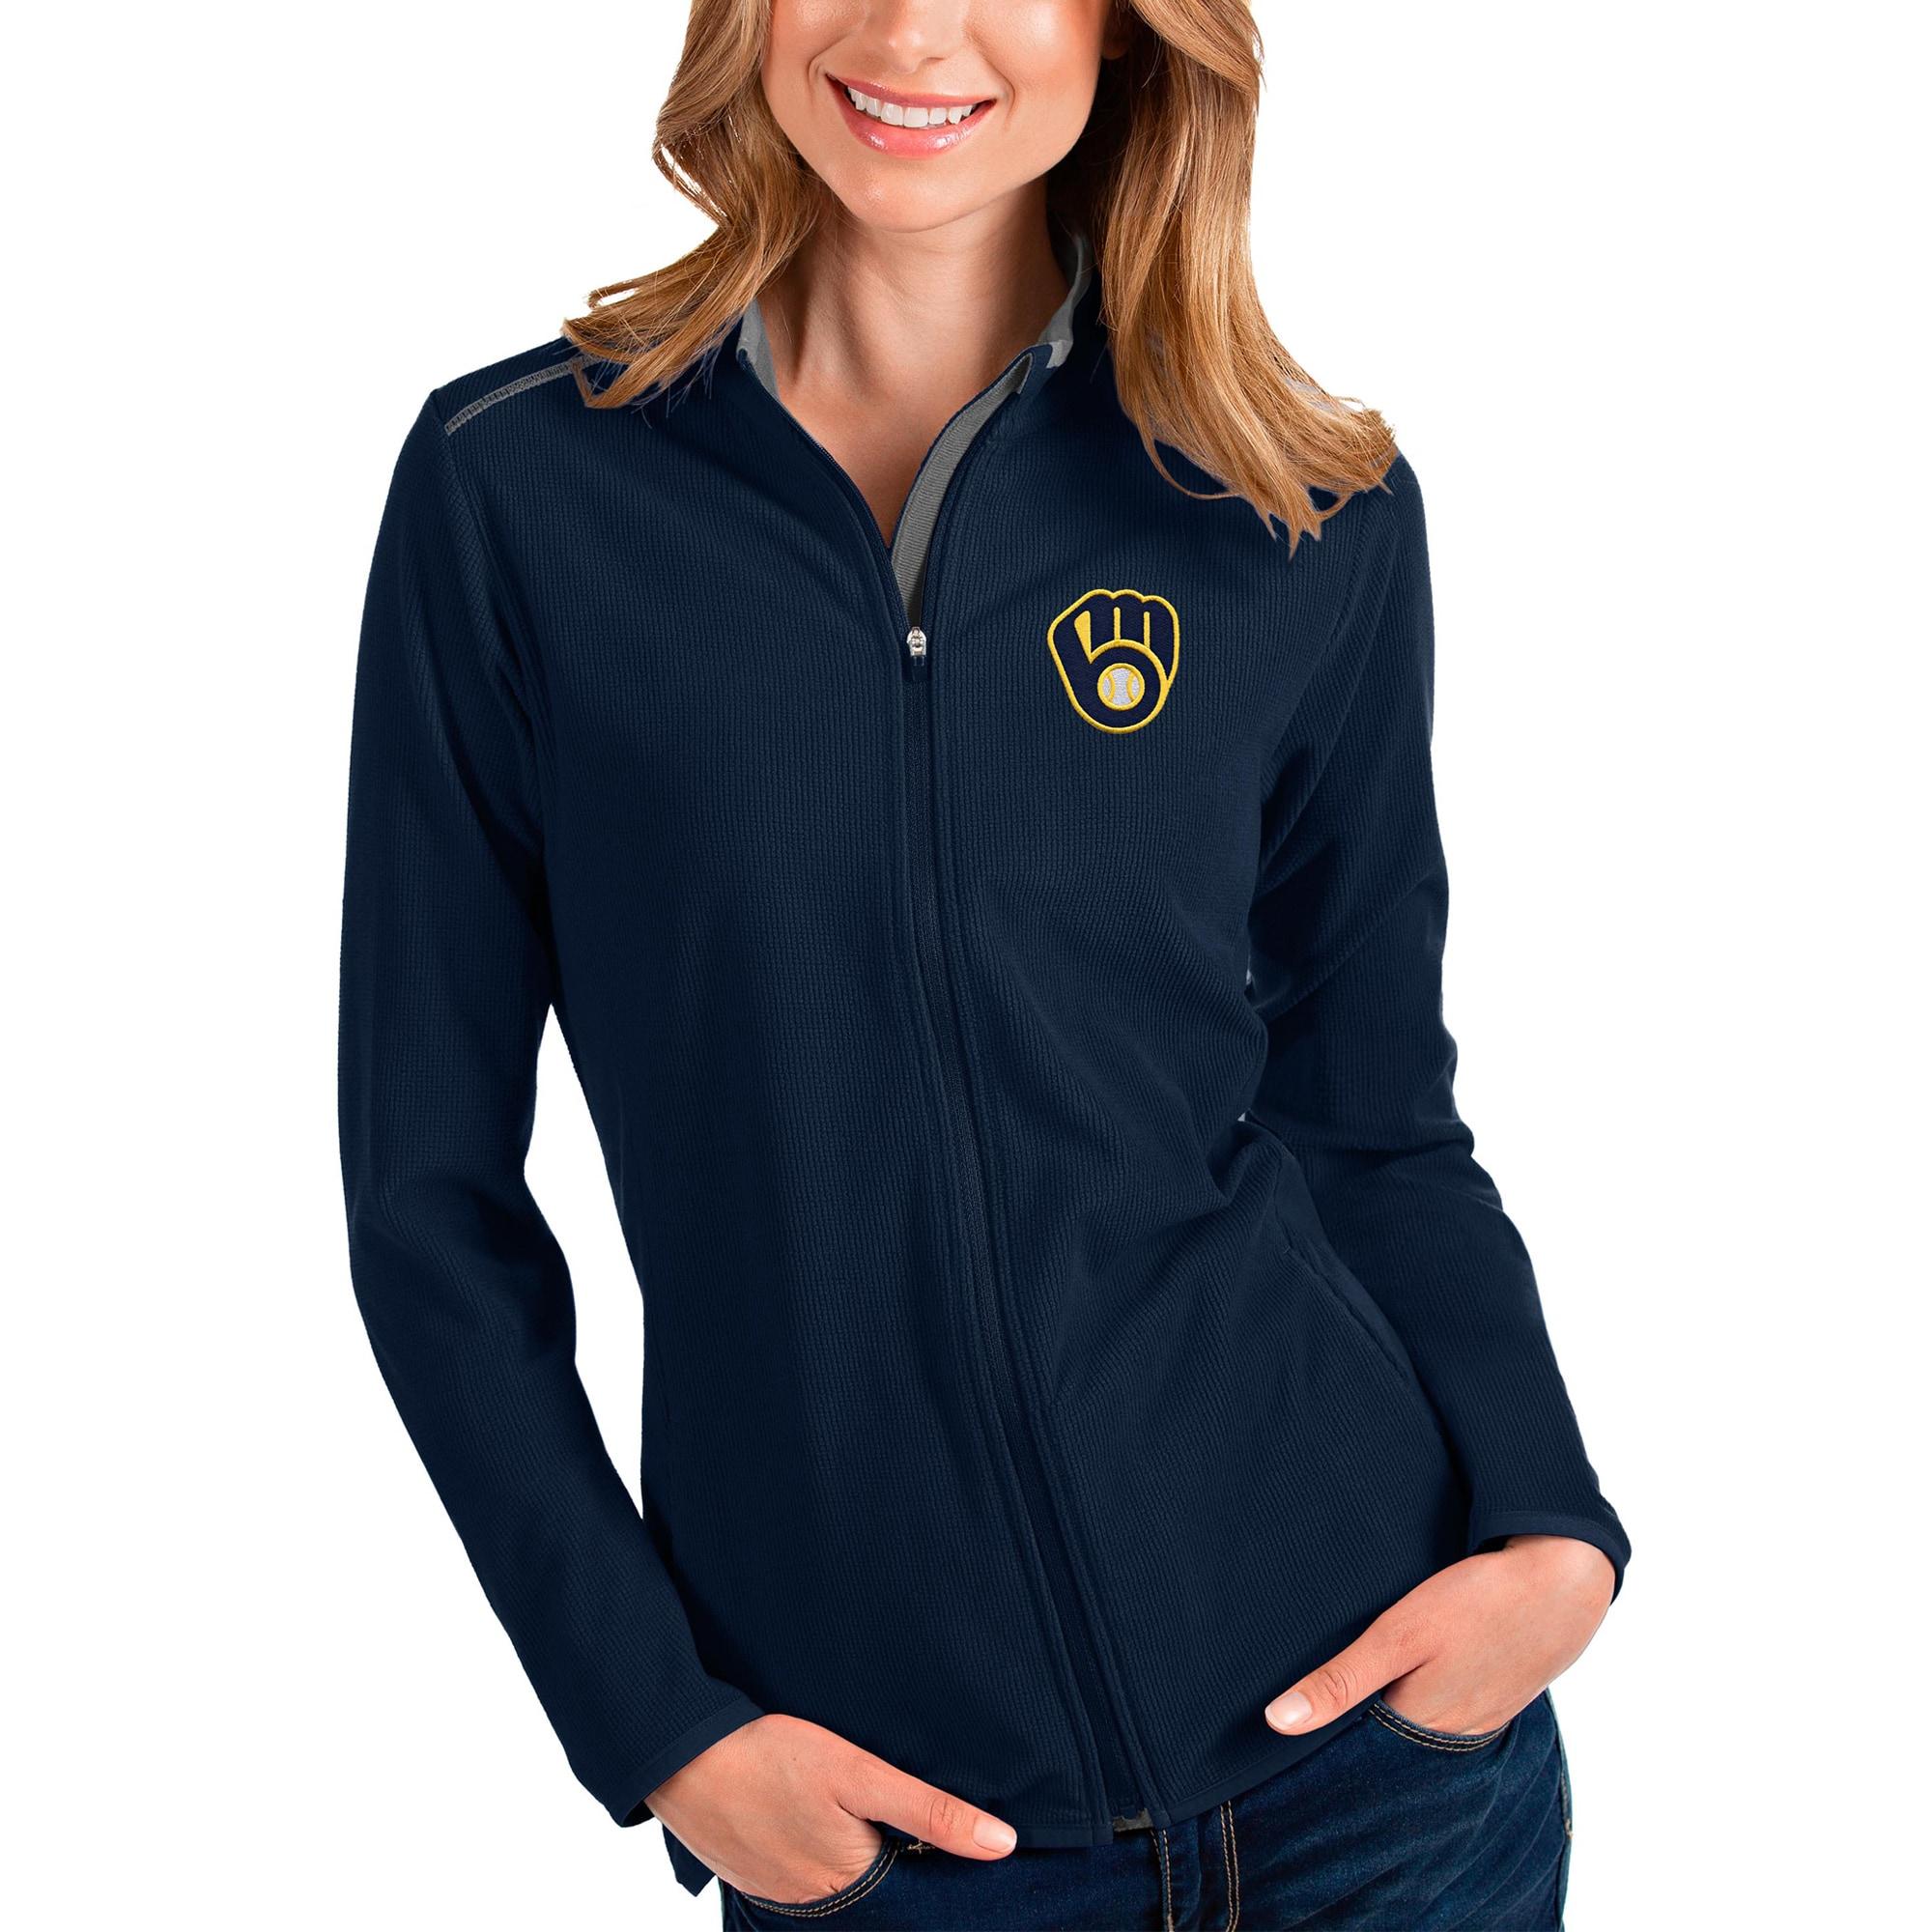 Milwaukee Brewers Antigua Women's Glacier Full-Zip Jacket - Navy/Charcoal